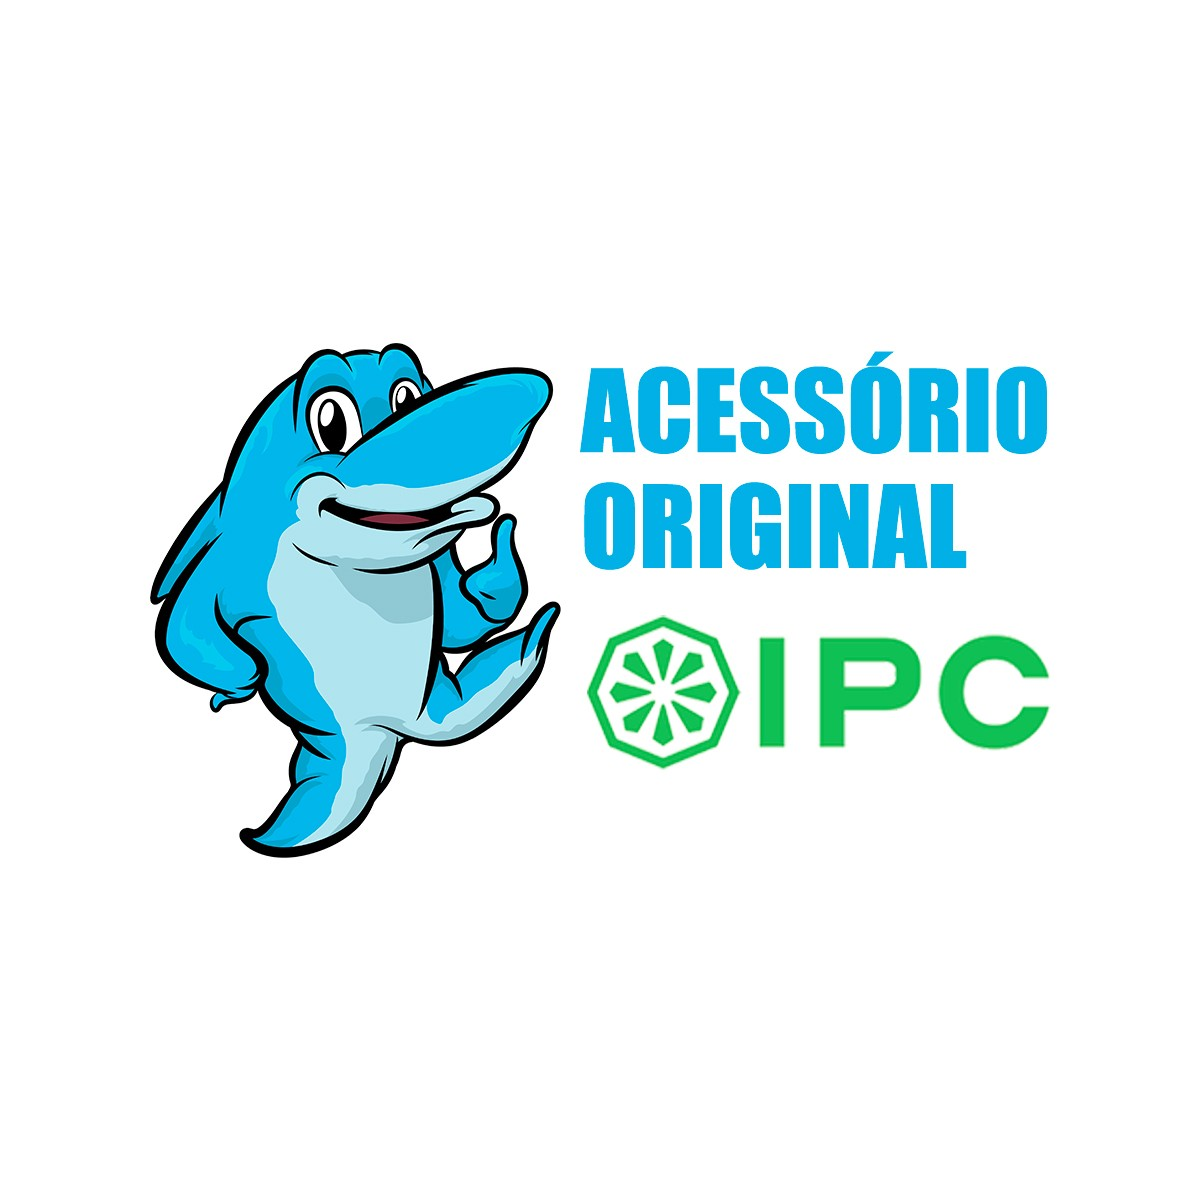 Filtro Anti-Espuma Original IPC Para Aspirador de pó Ecoclean